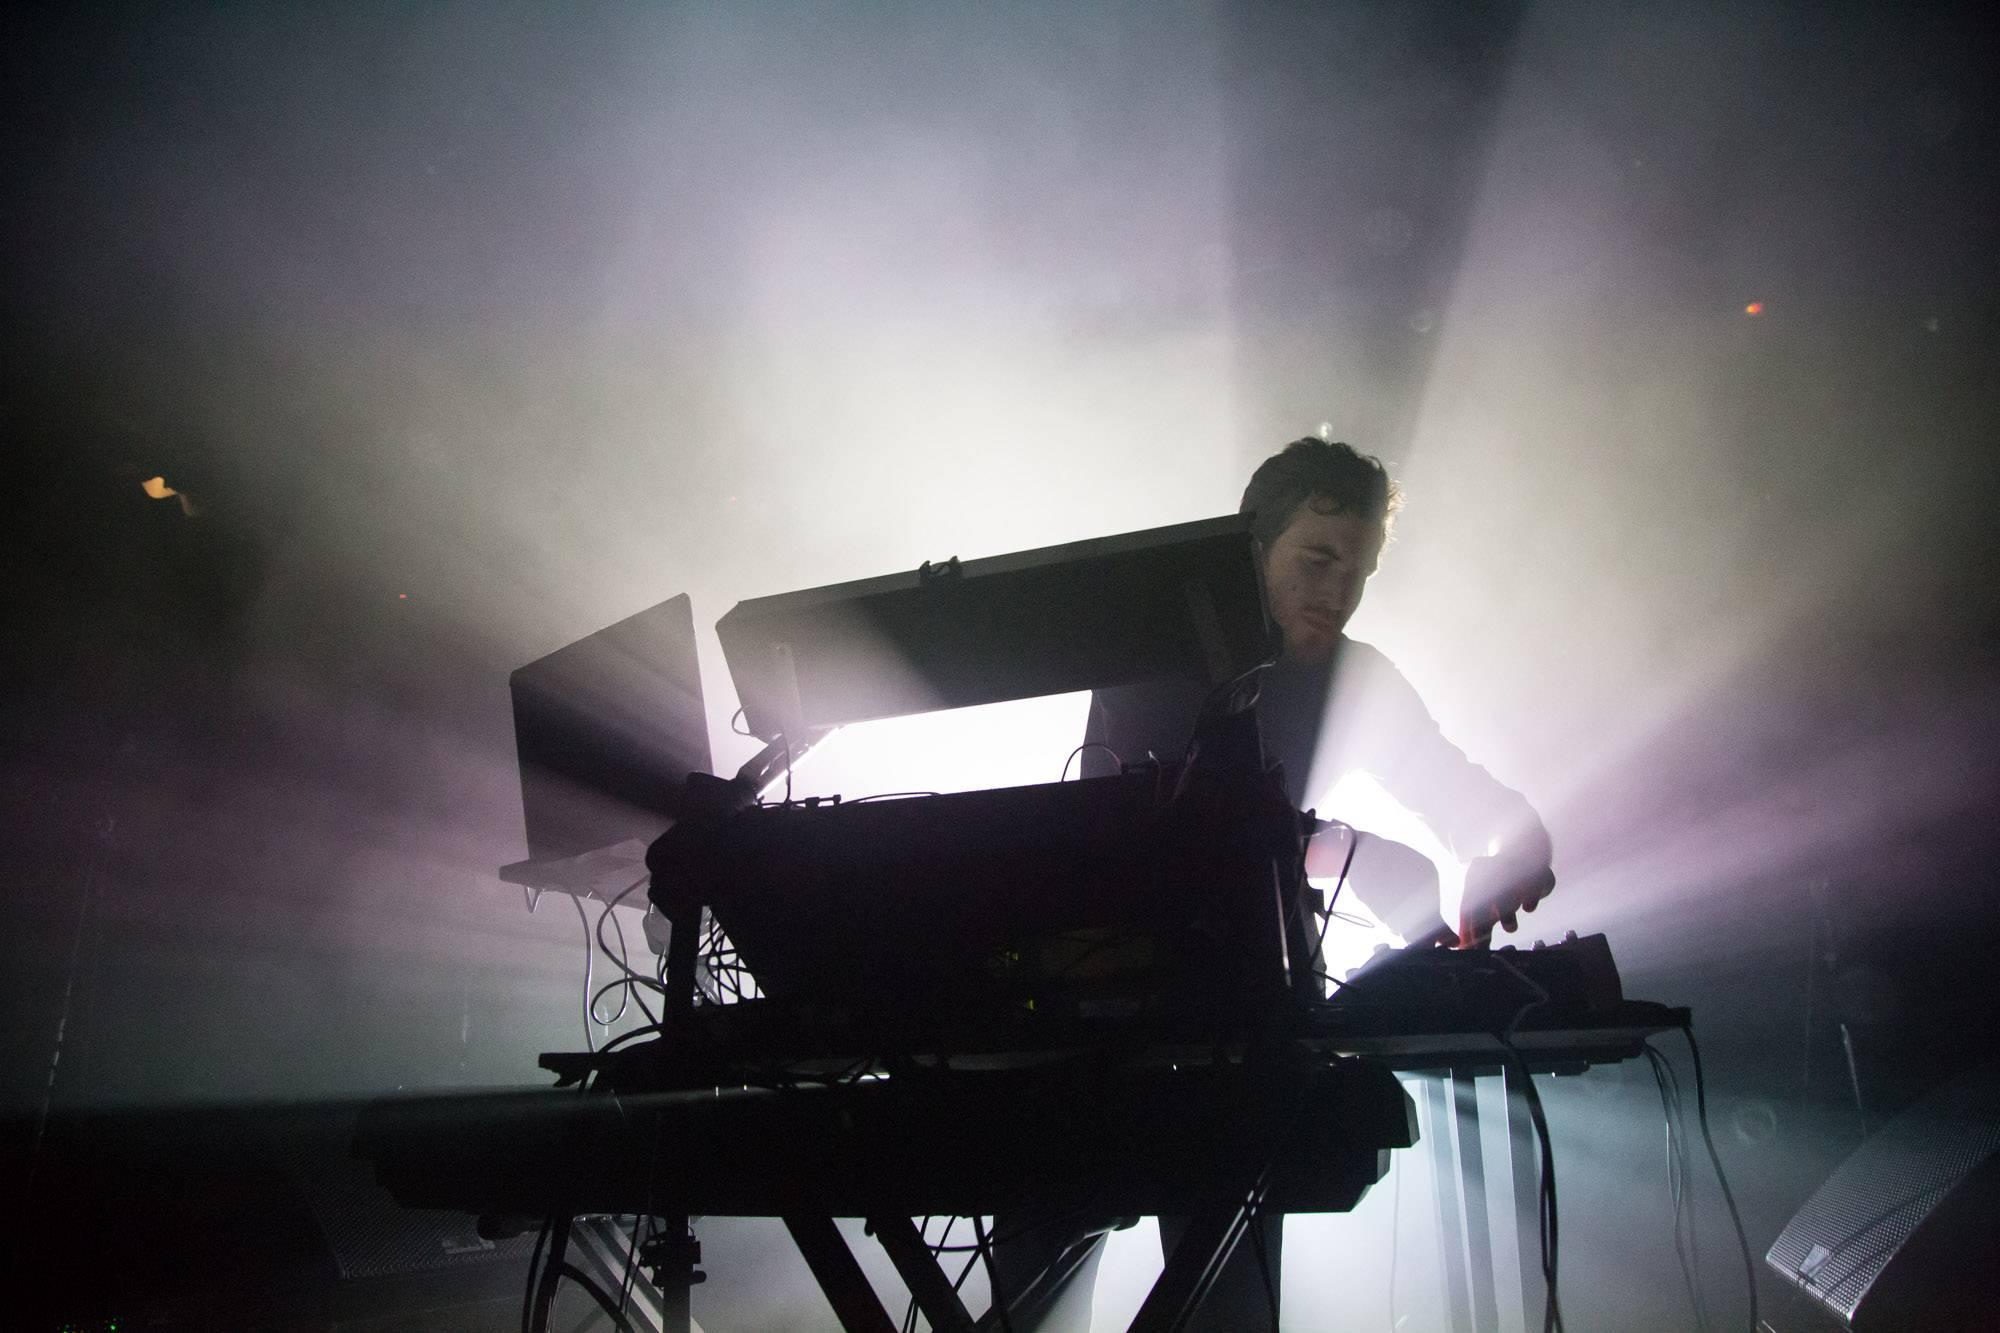 Nicolas Jaar at the Commodore Ballroom, Vancouver, Nov. 1 2016. Kirk Chantraine photo.